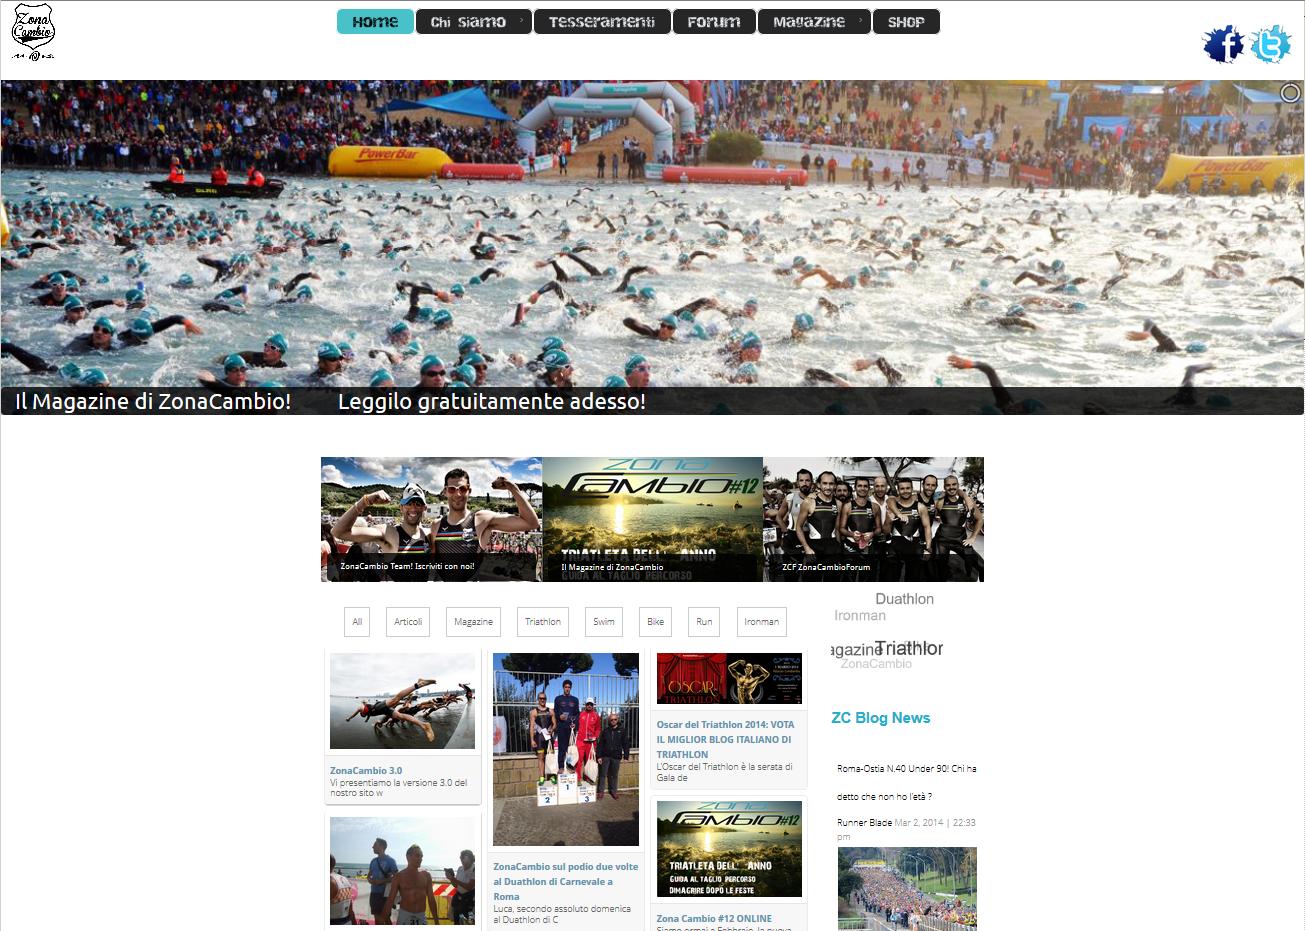 www.zonacambio.com